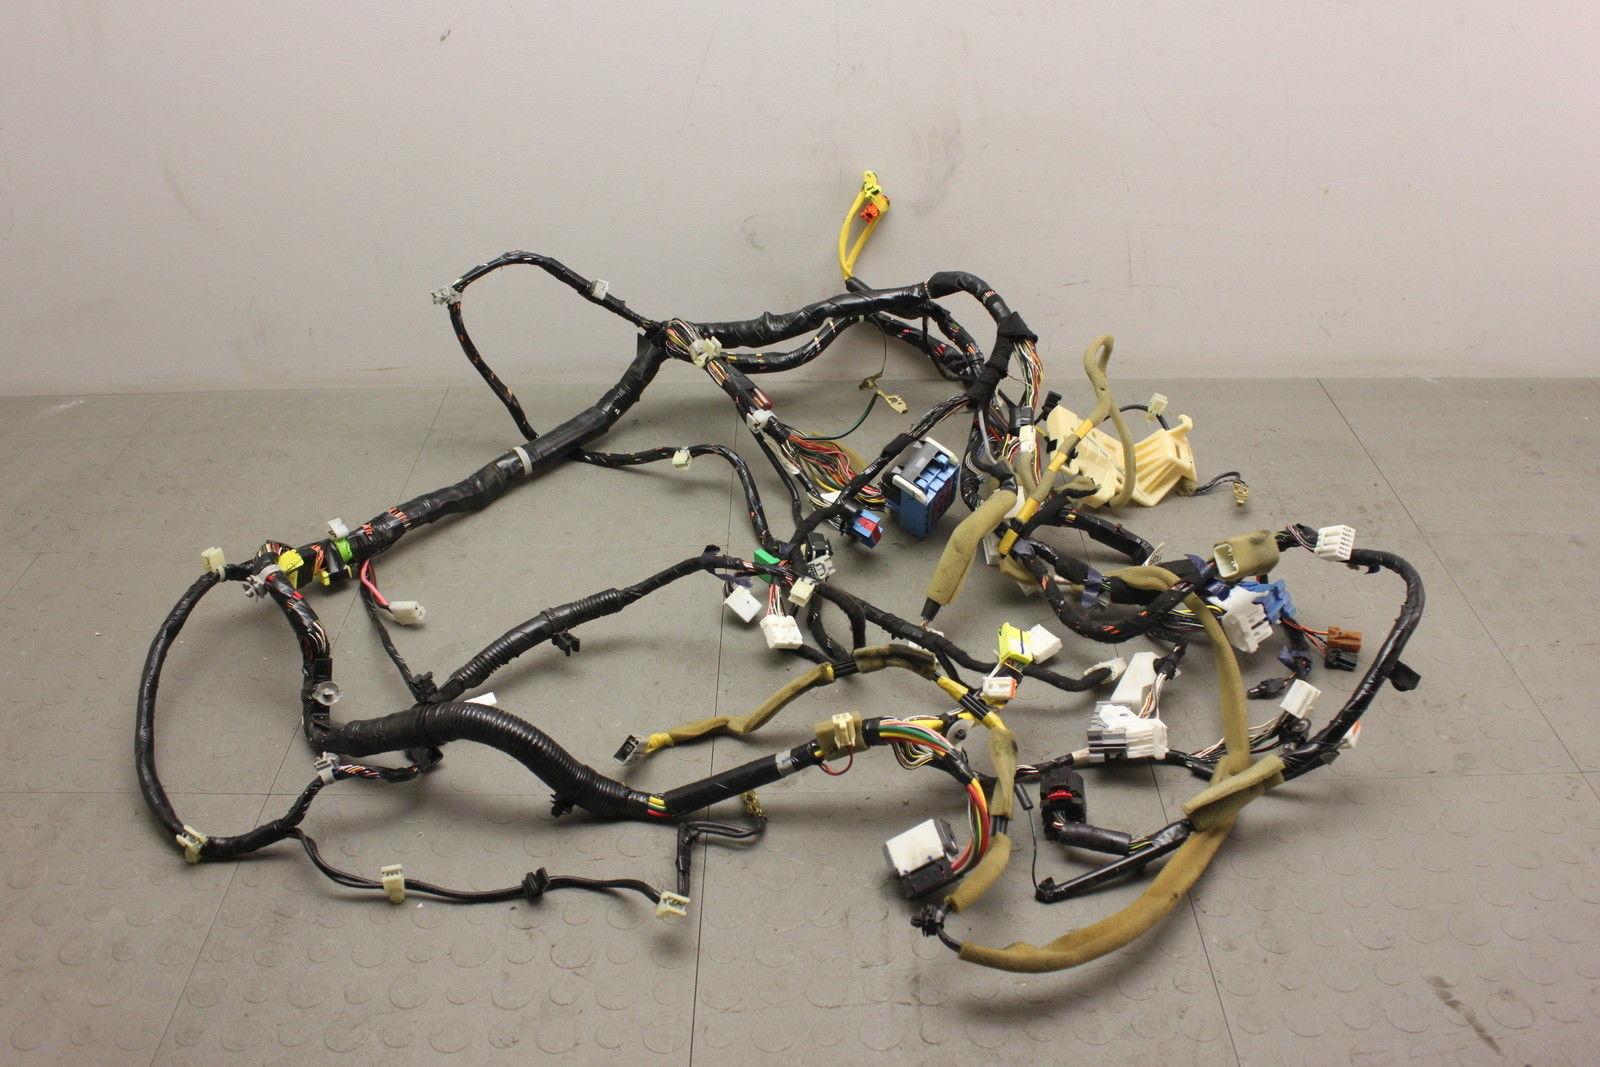 Mazda 3 Wiring Harness Simple Diagram 06 09 Mazda3 Interior Dash Dashboard Wire Spark Plug